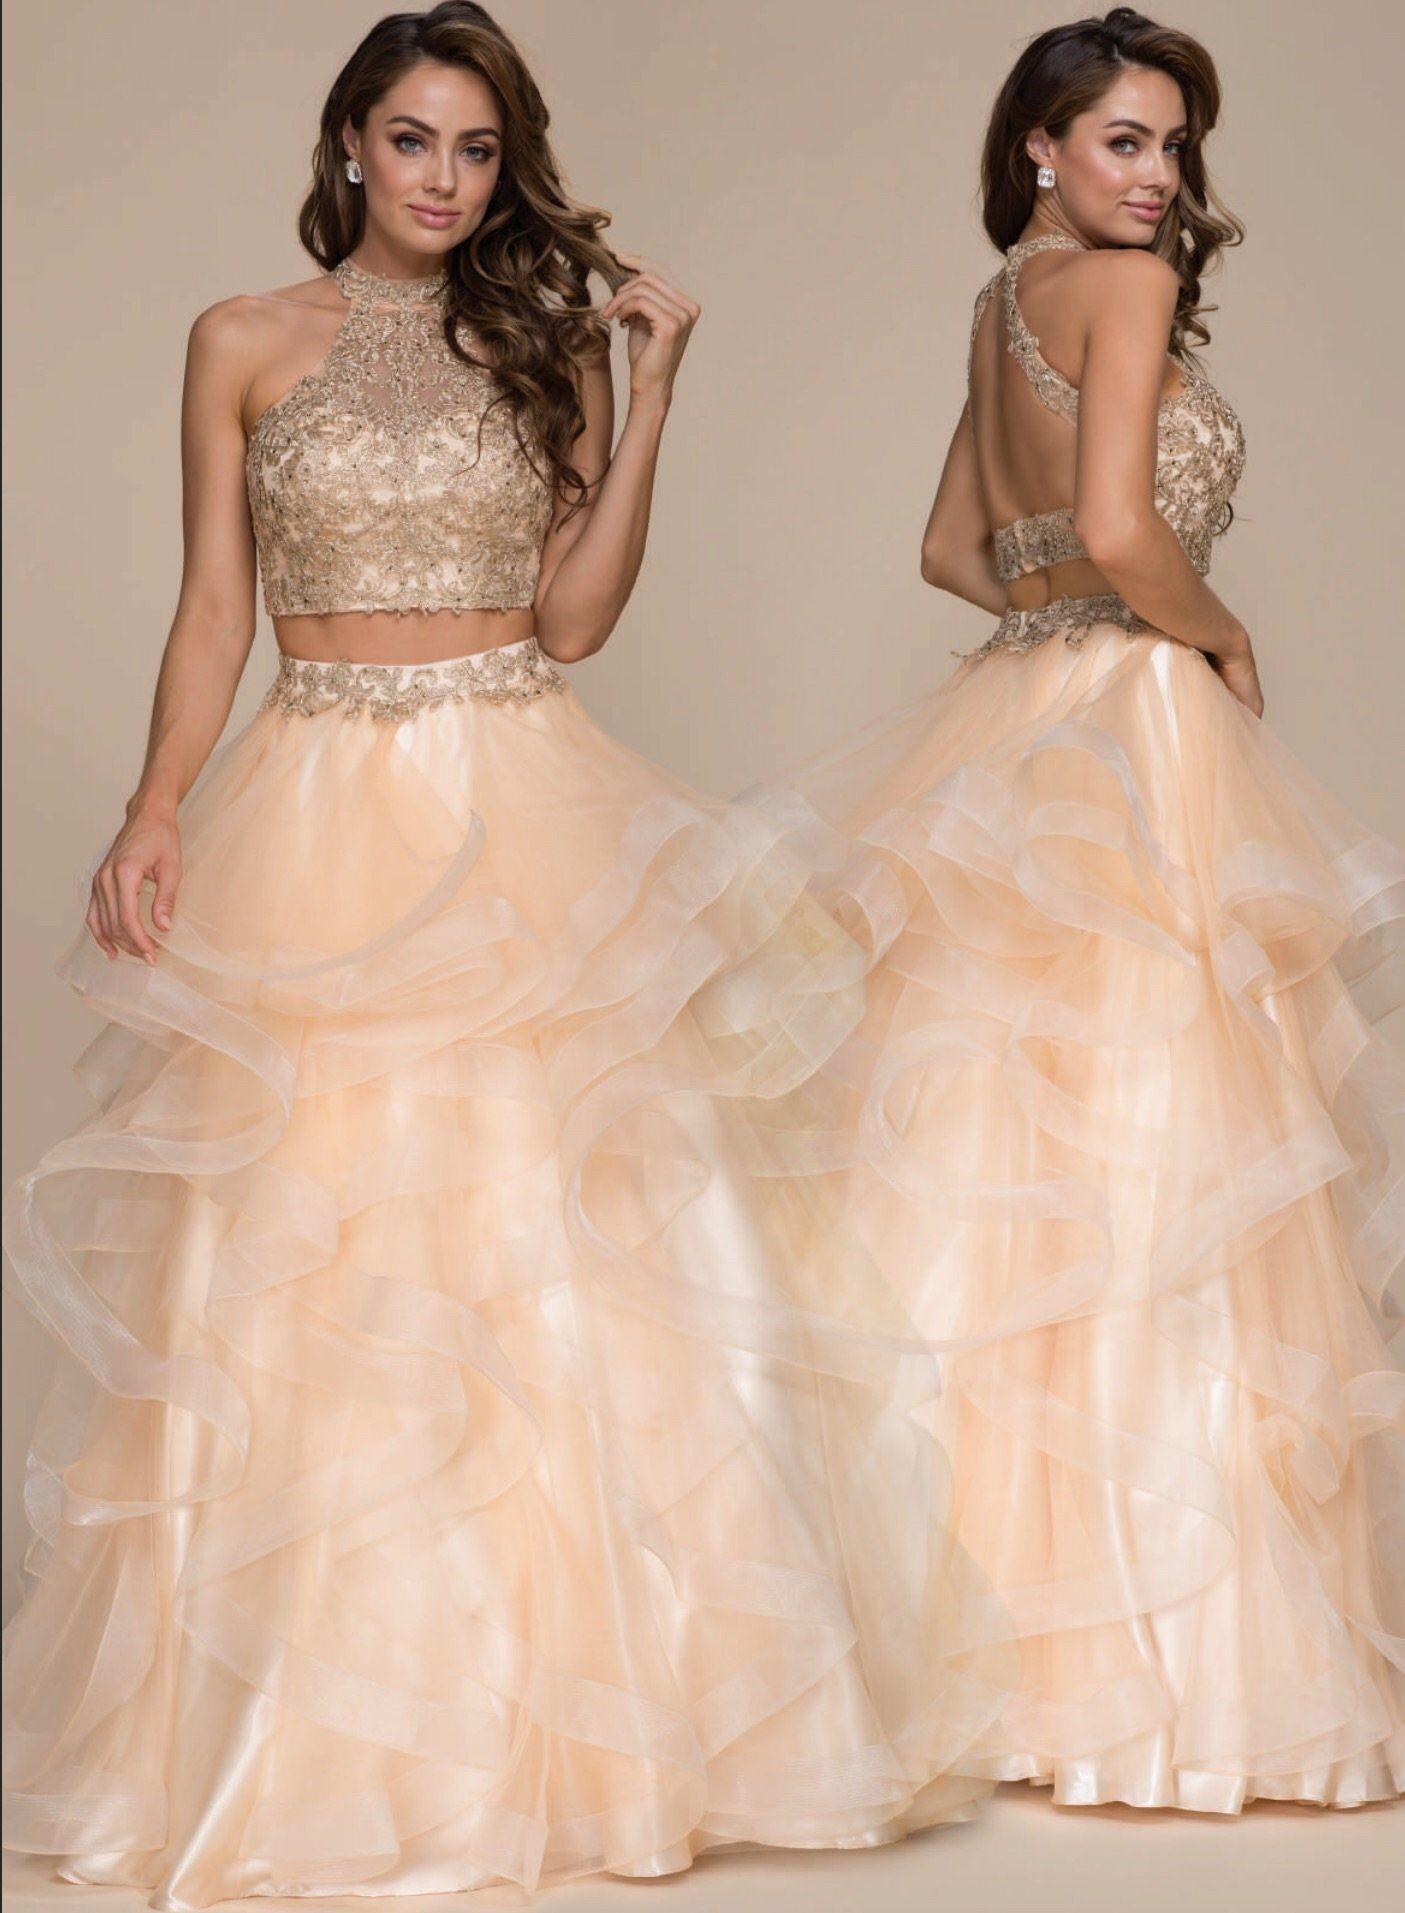 Gold 2Piece Detailed Bodice Formal Dress Formal dresses